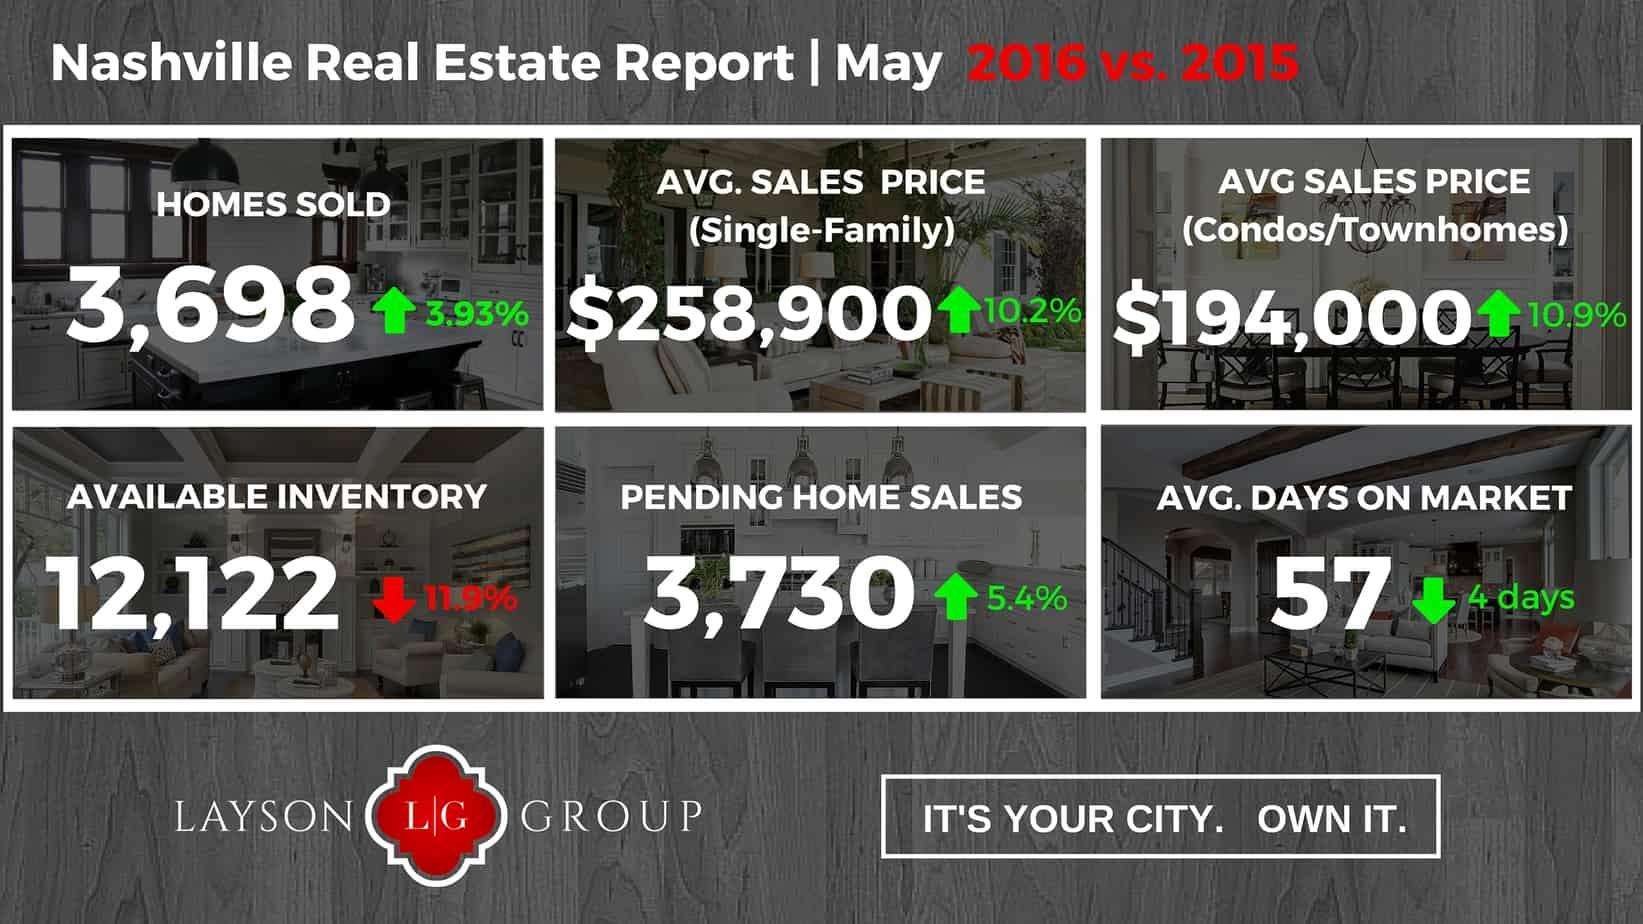 Nashville May 2016 Home Sales